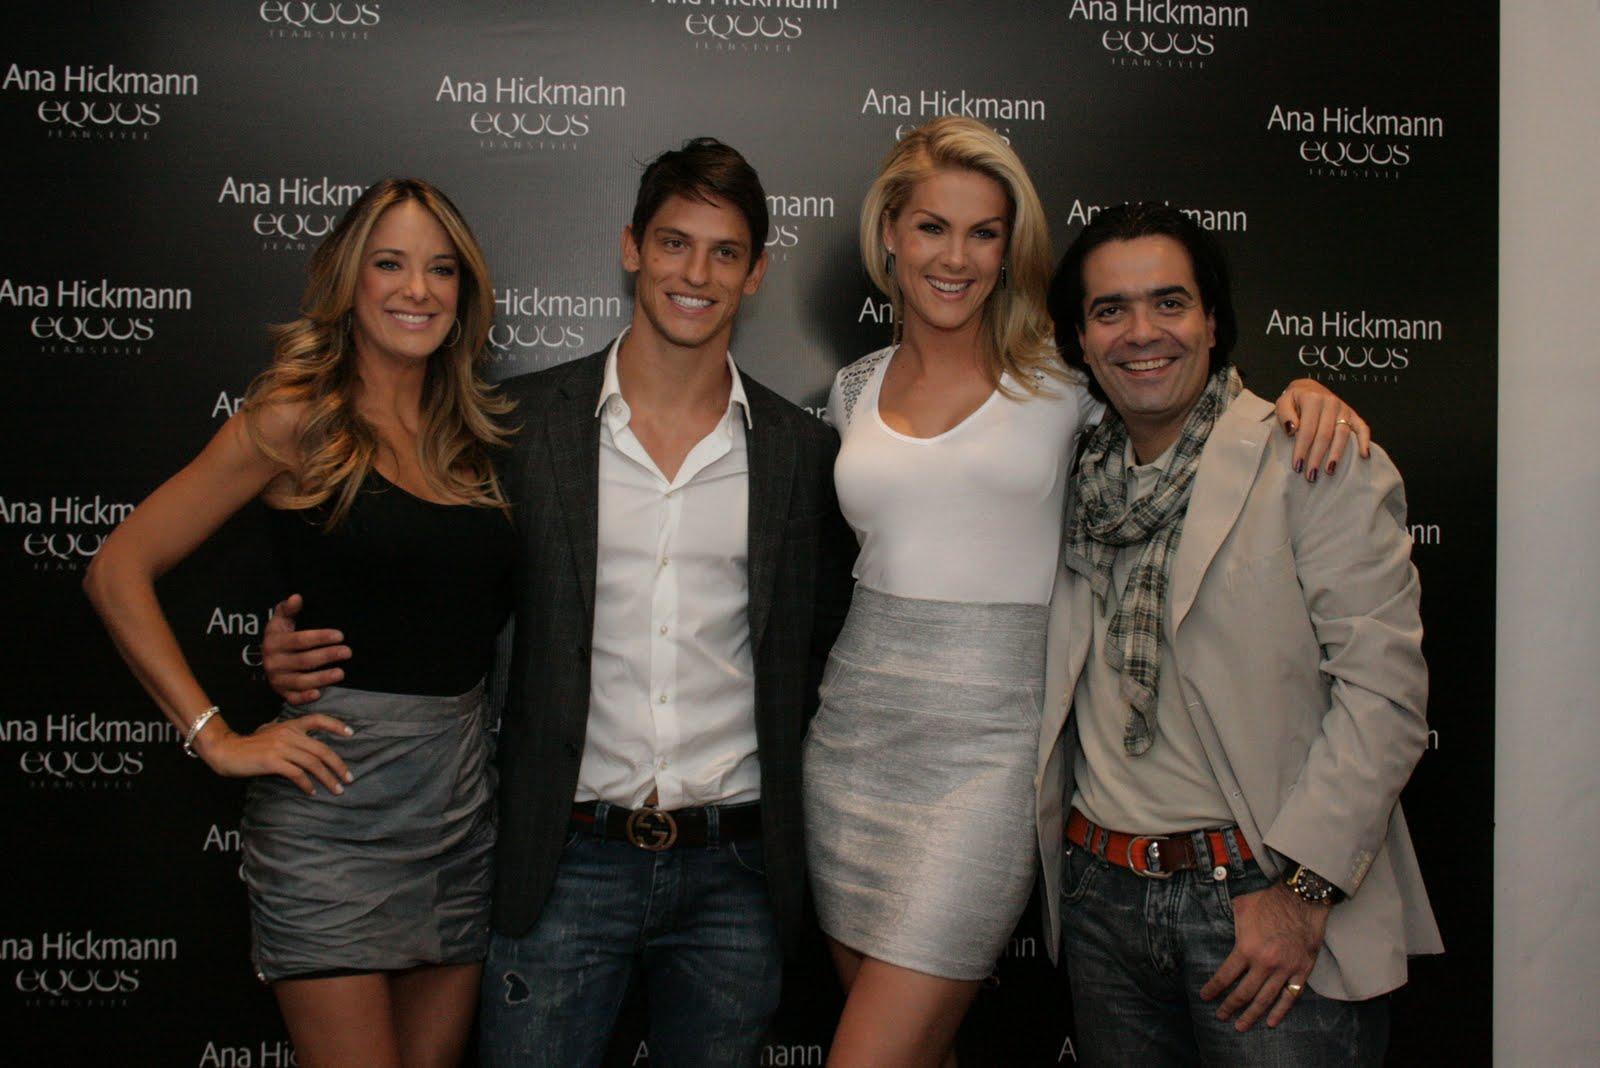 http://3.bp.blogspot.com/_wHB2bEAqd1w/THWOJrw1diI/AAAAAAAAASc/KOzGHQPOrG0/s1600/Ticiane-Pinheiro_Miro_Moreira_Ana-Hickmann_Fabio_arruda.jpg